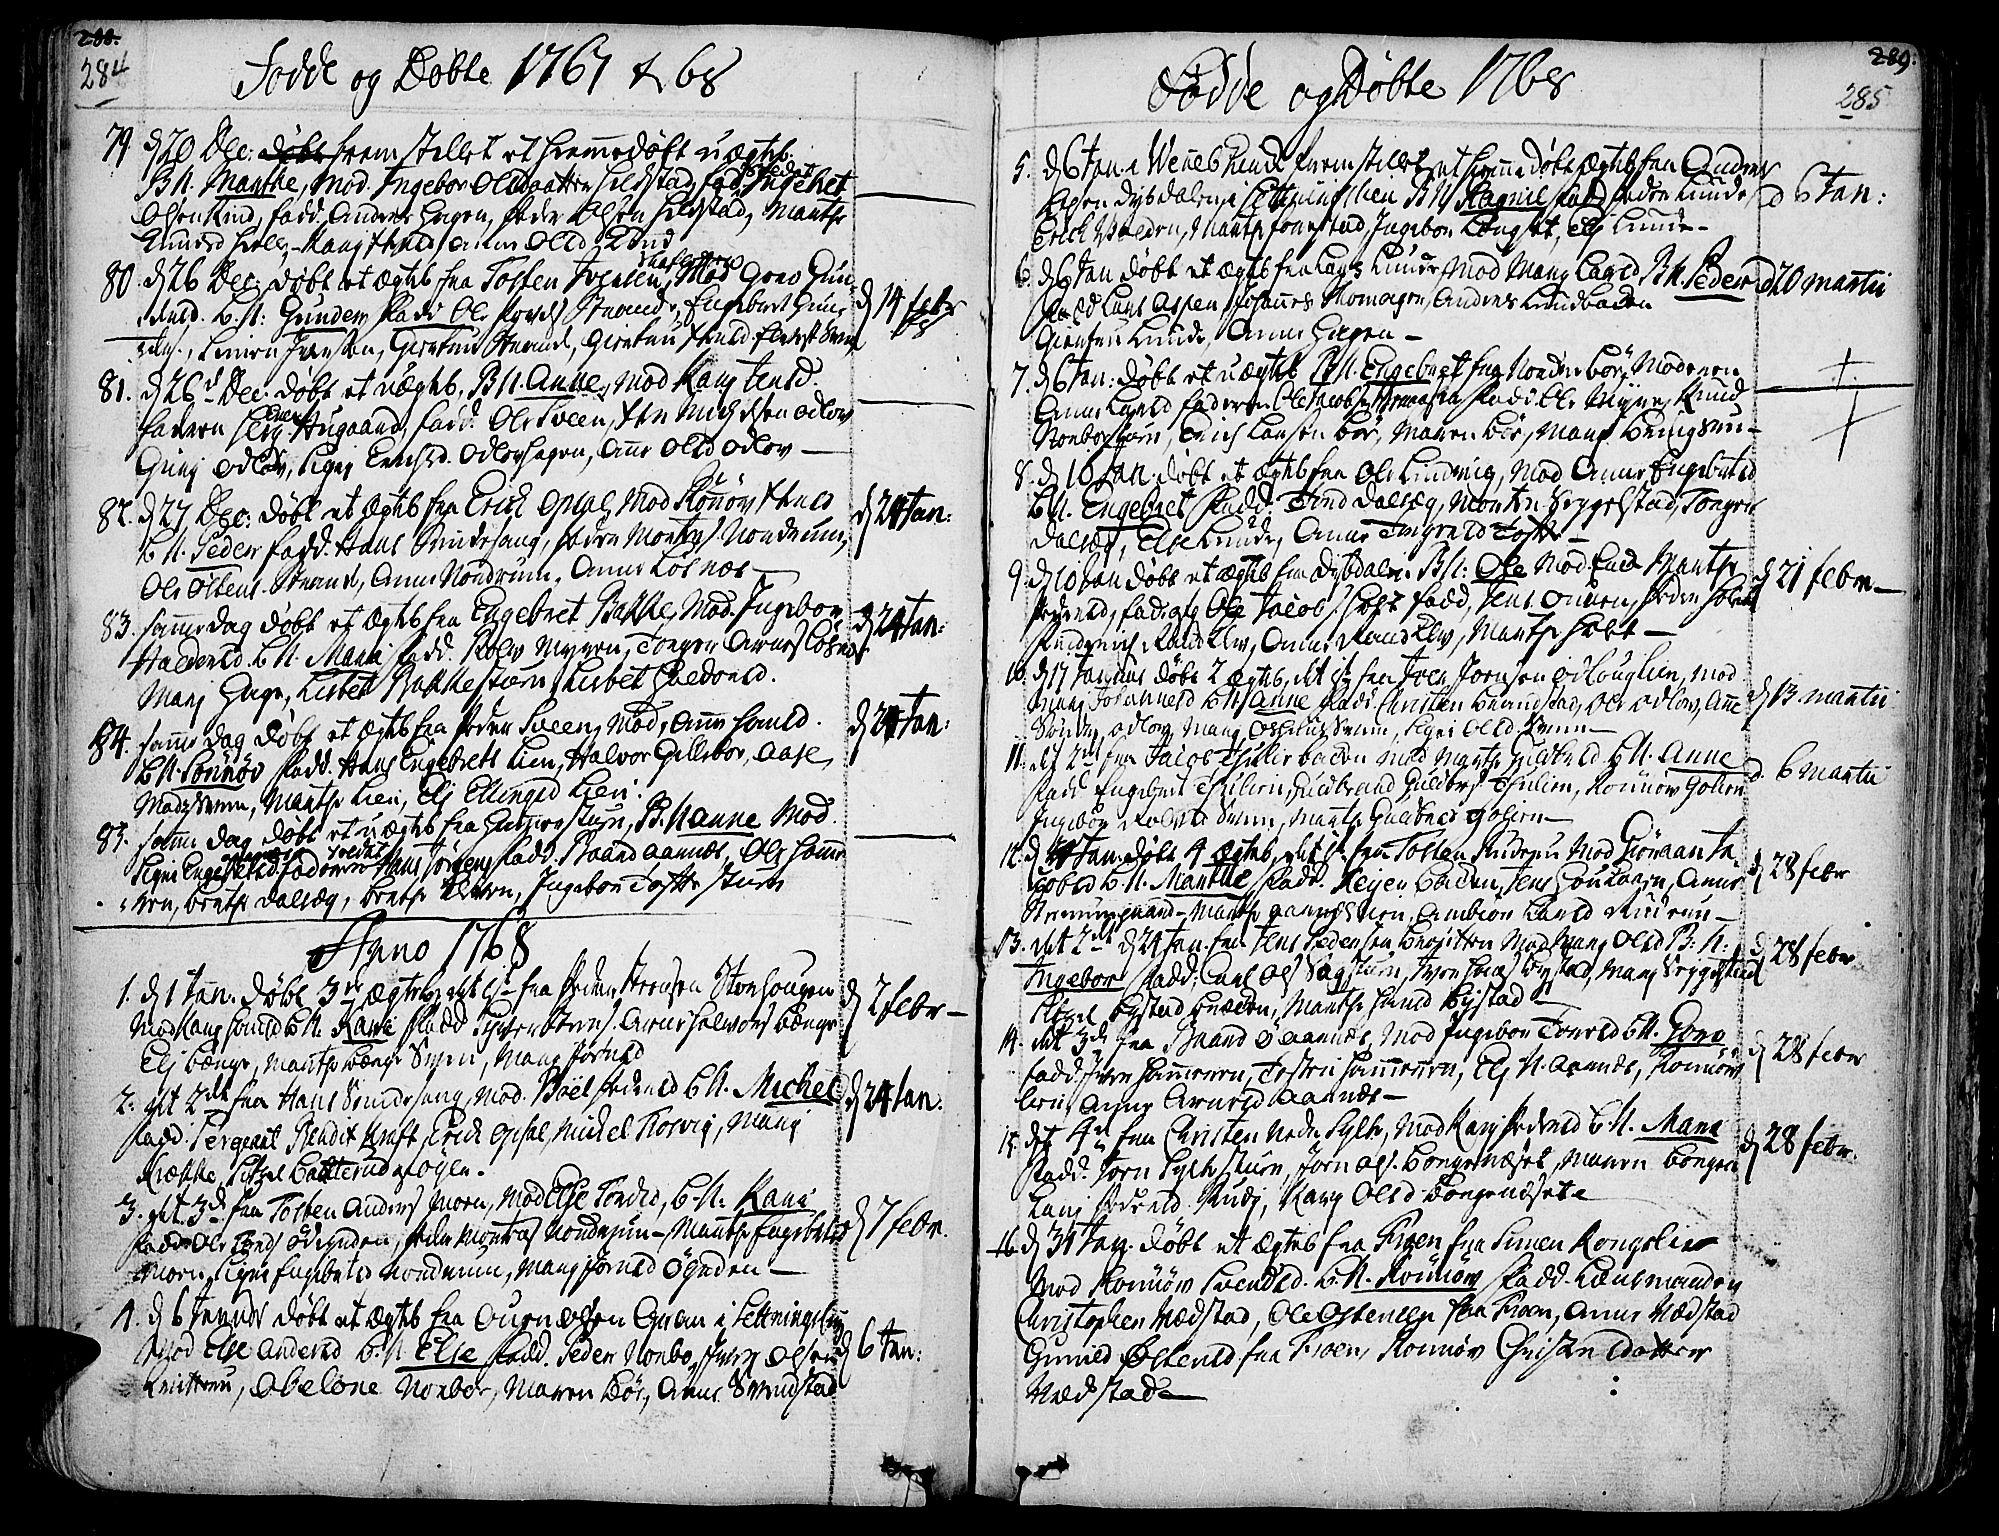 SAH, Ringebu prestekontor, Ministerialbok nr. 2, 1734-1780, s. 284-285